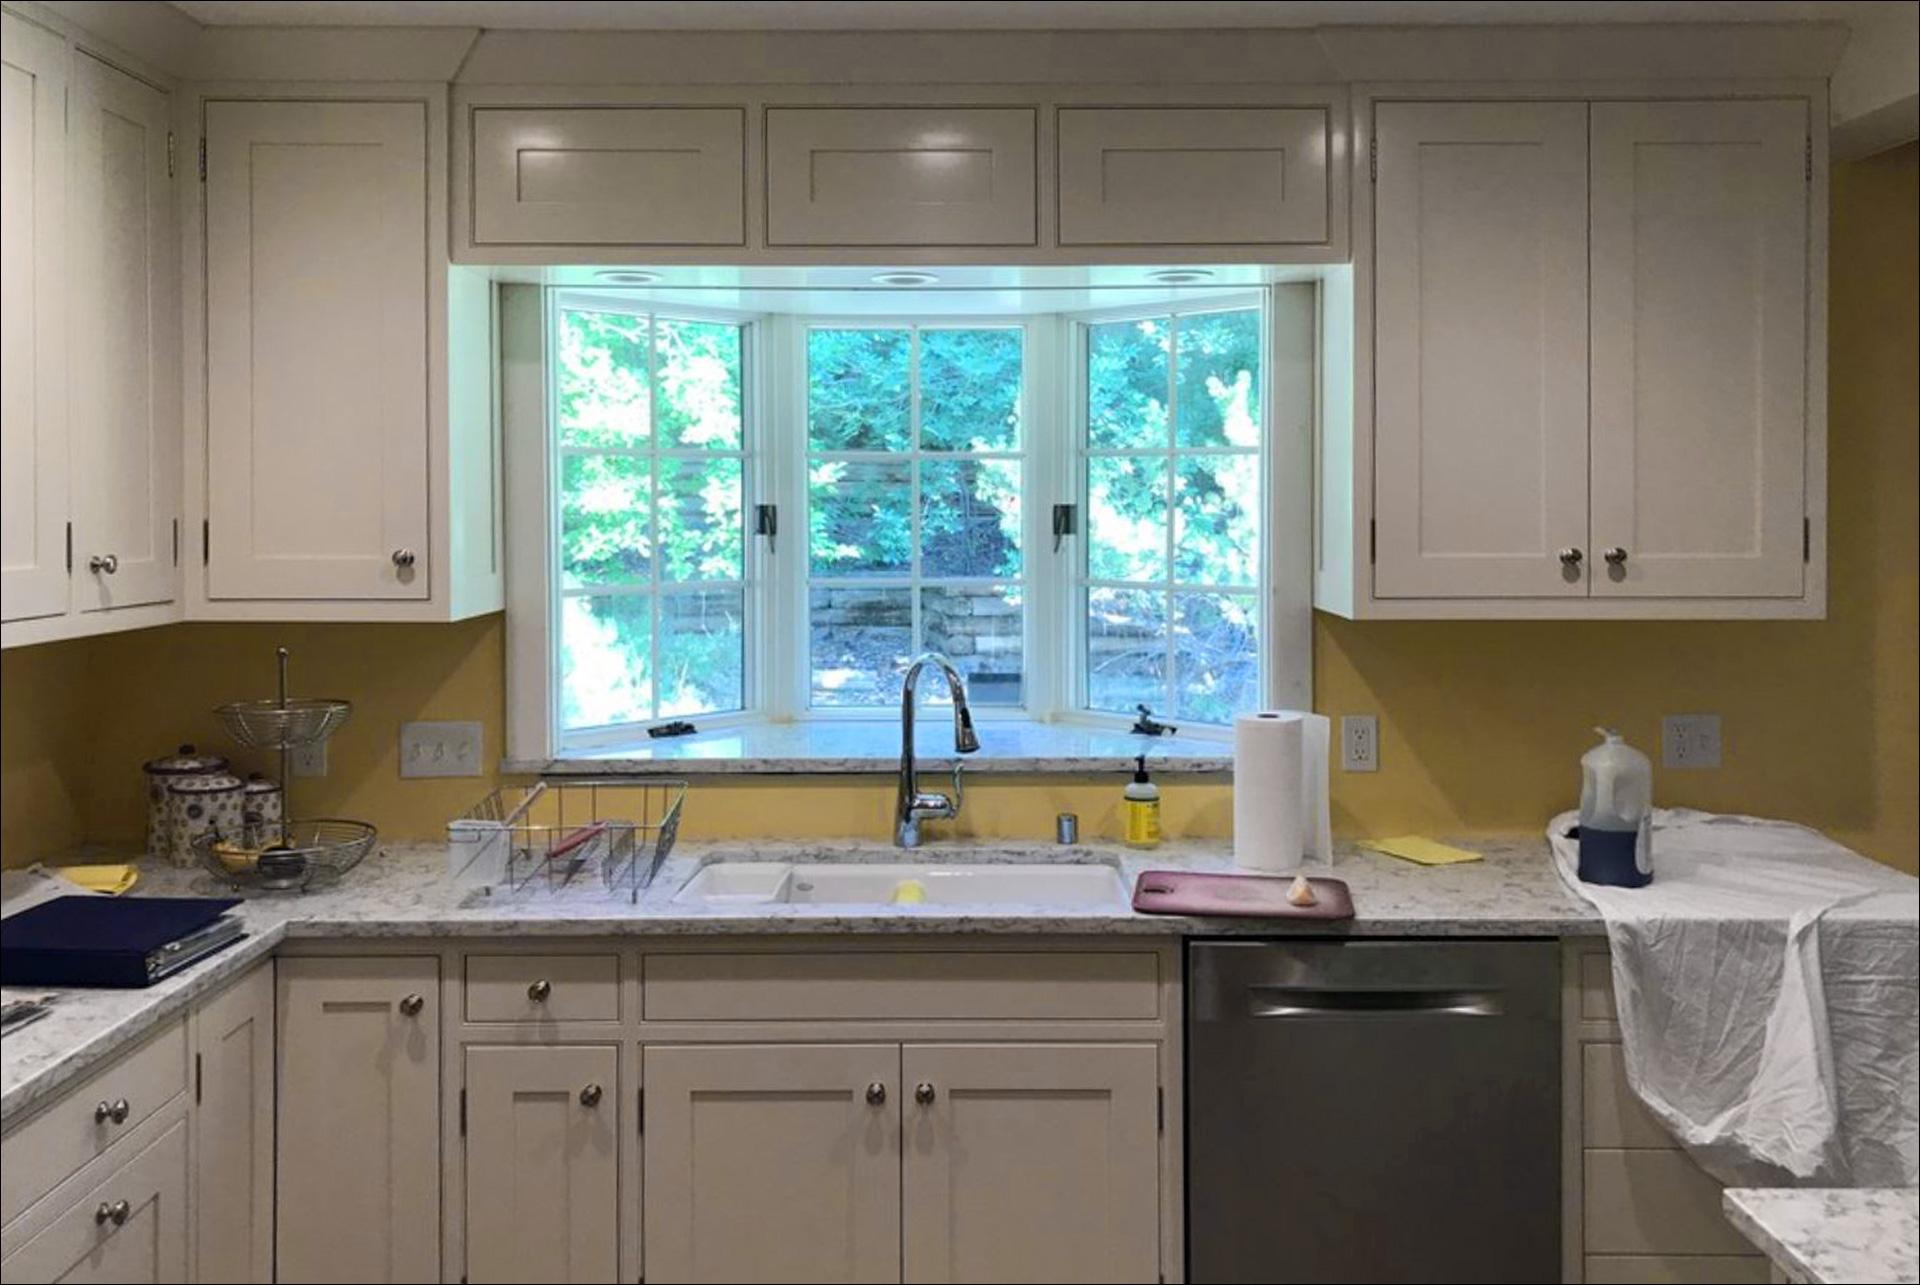 Kitchen Remodel White Cabinets White Marble Countertops Outset Windows New Kitchen Appliances 4 Johnson Construction